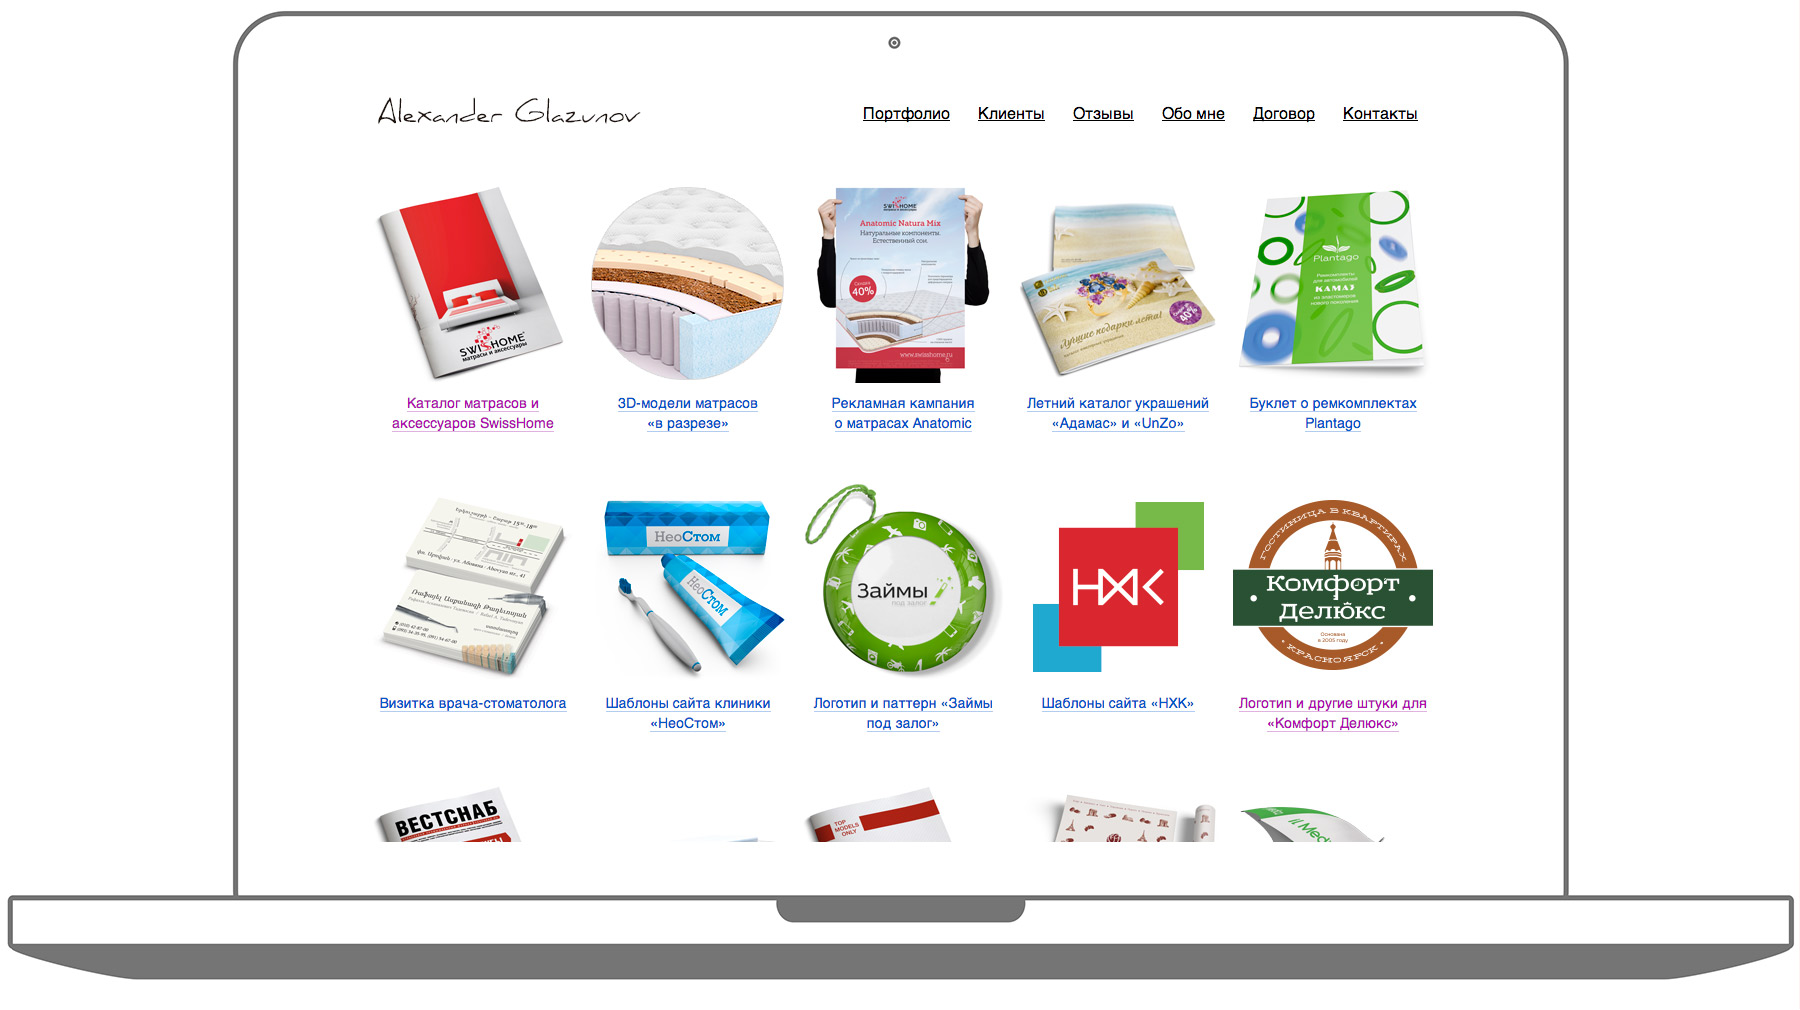 Гланая страница сайта дизайнера Александра Глазунова